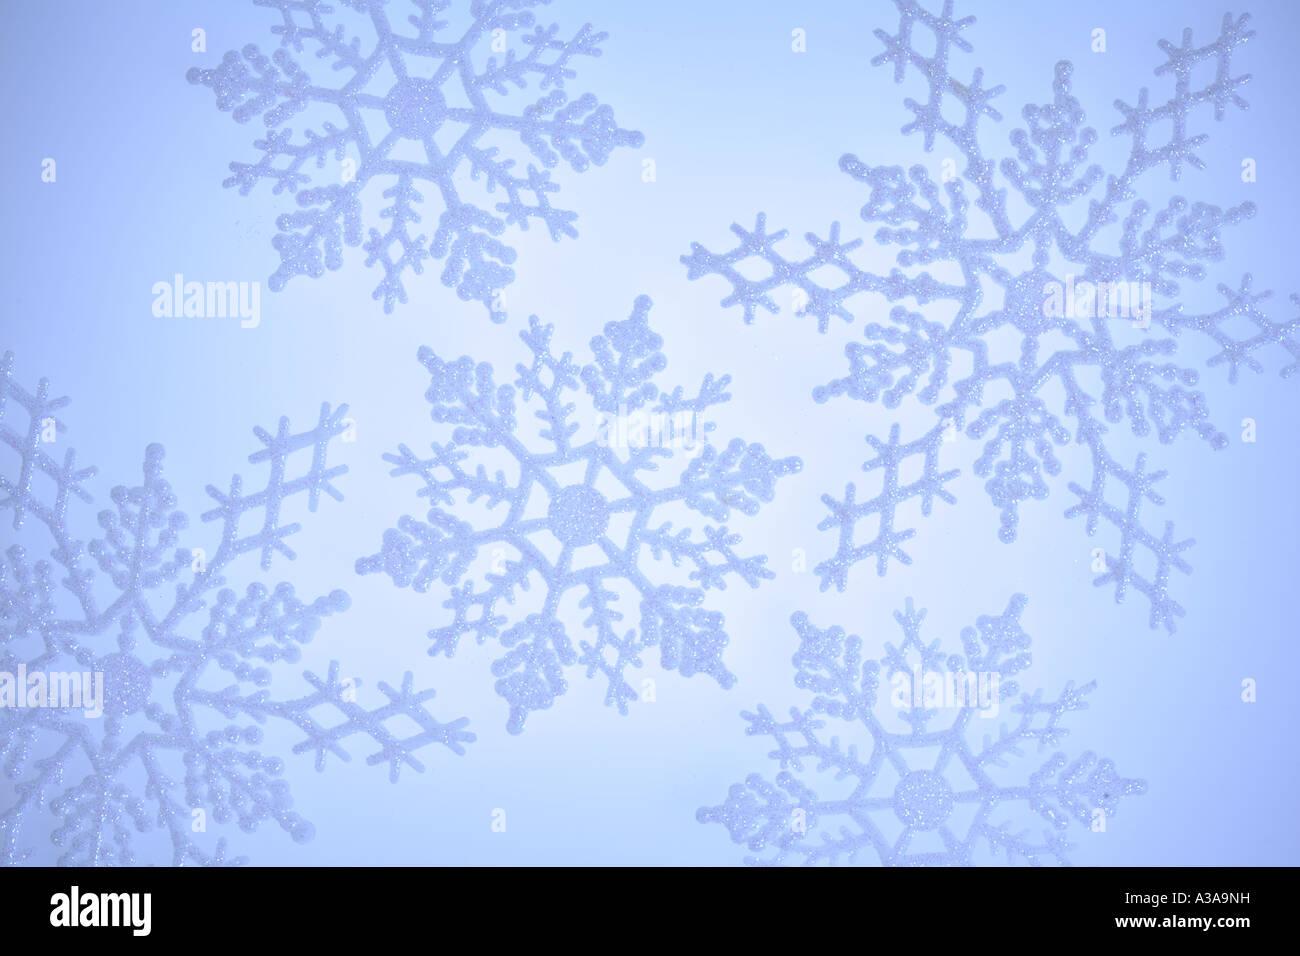 Snowflake Ornaments - Stock Image